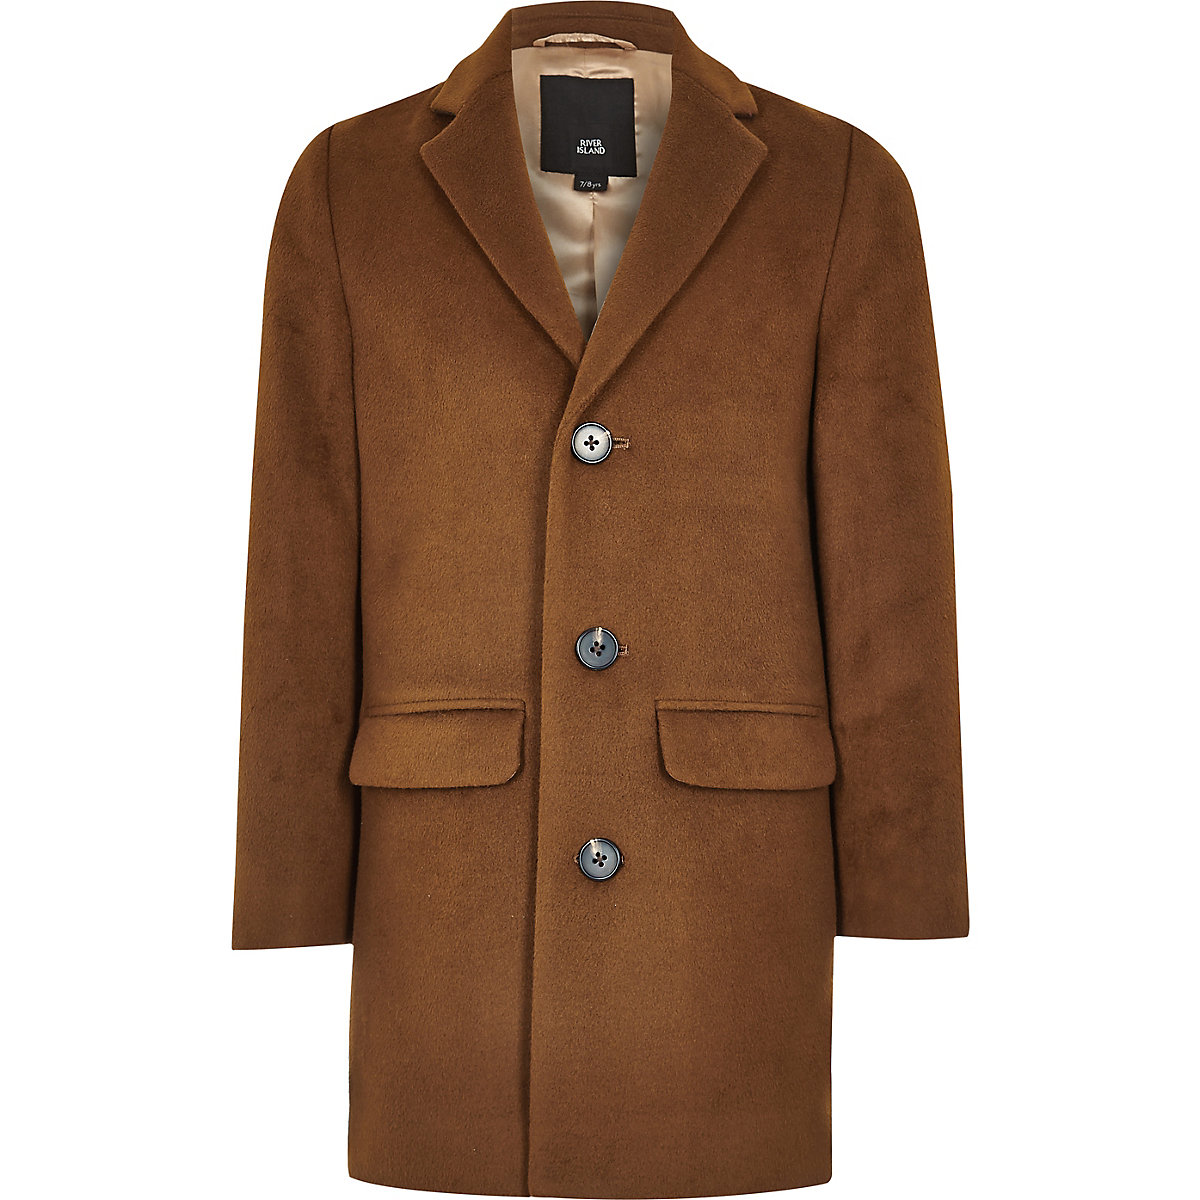 Brauner, klassischer Mantel